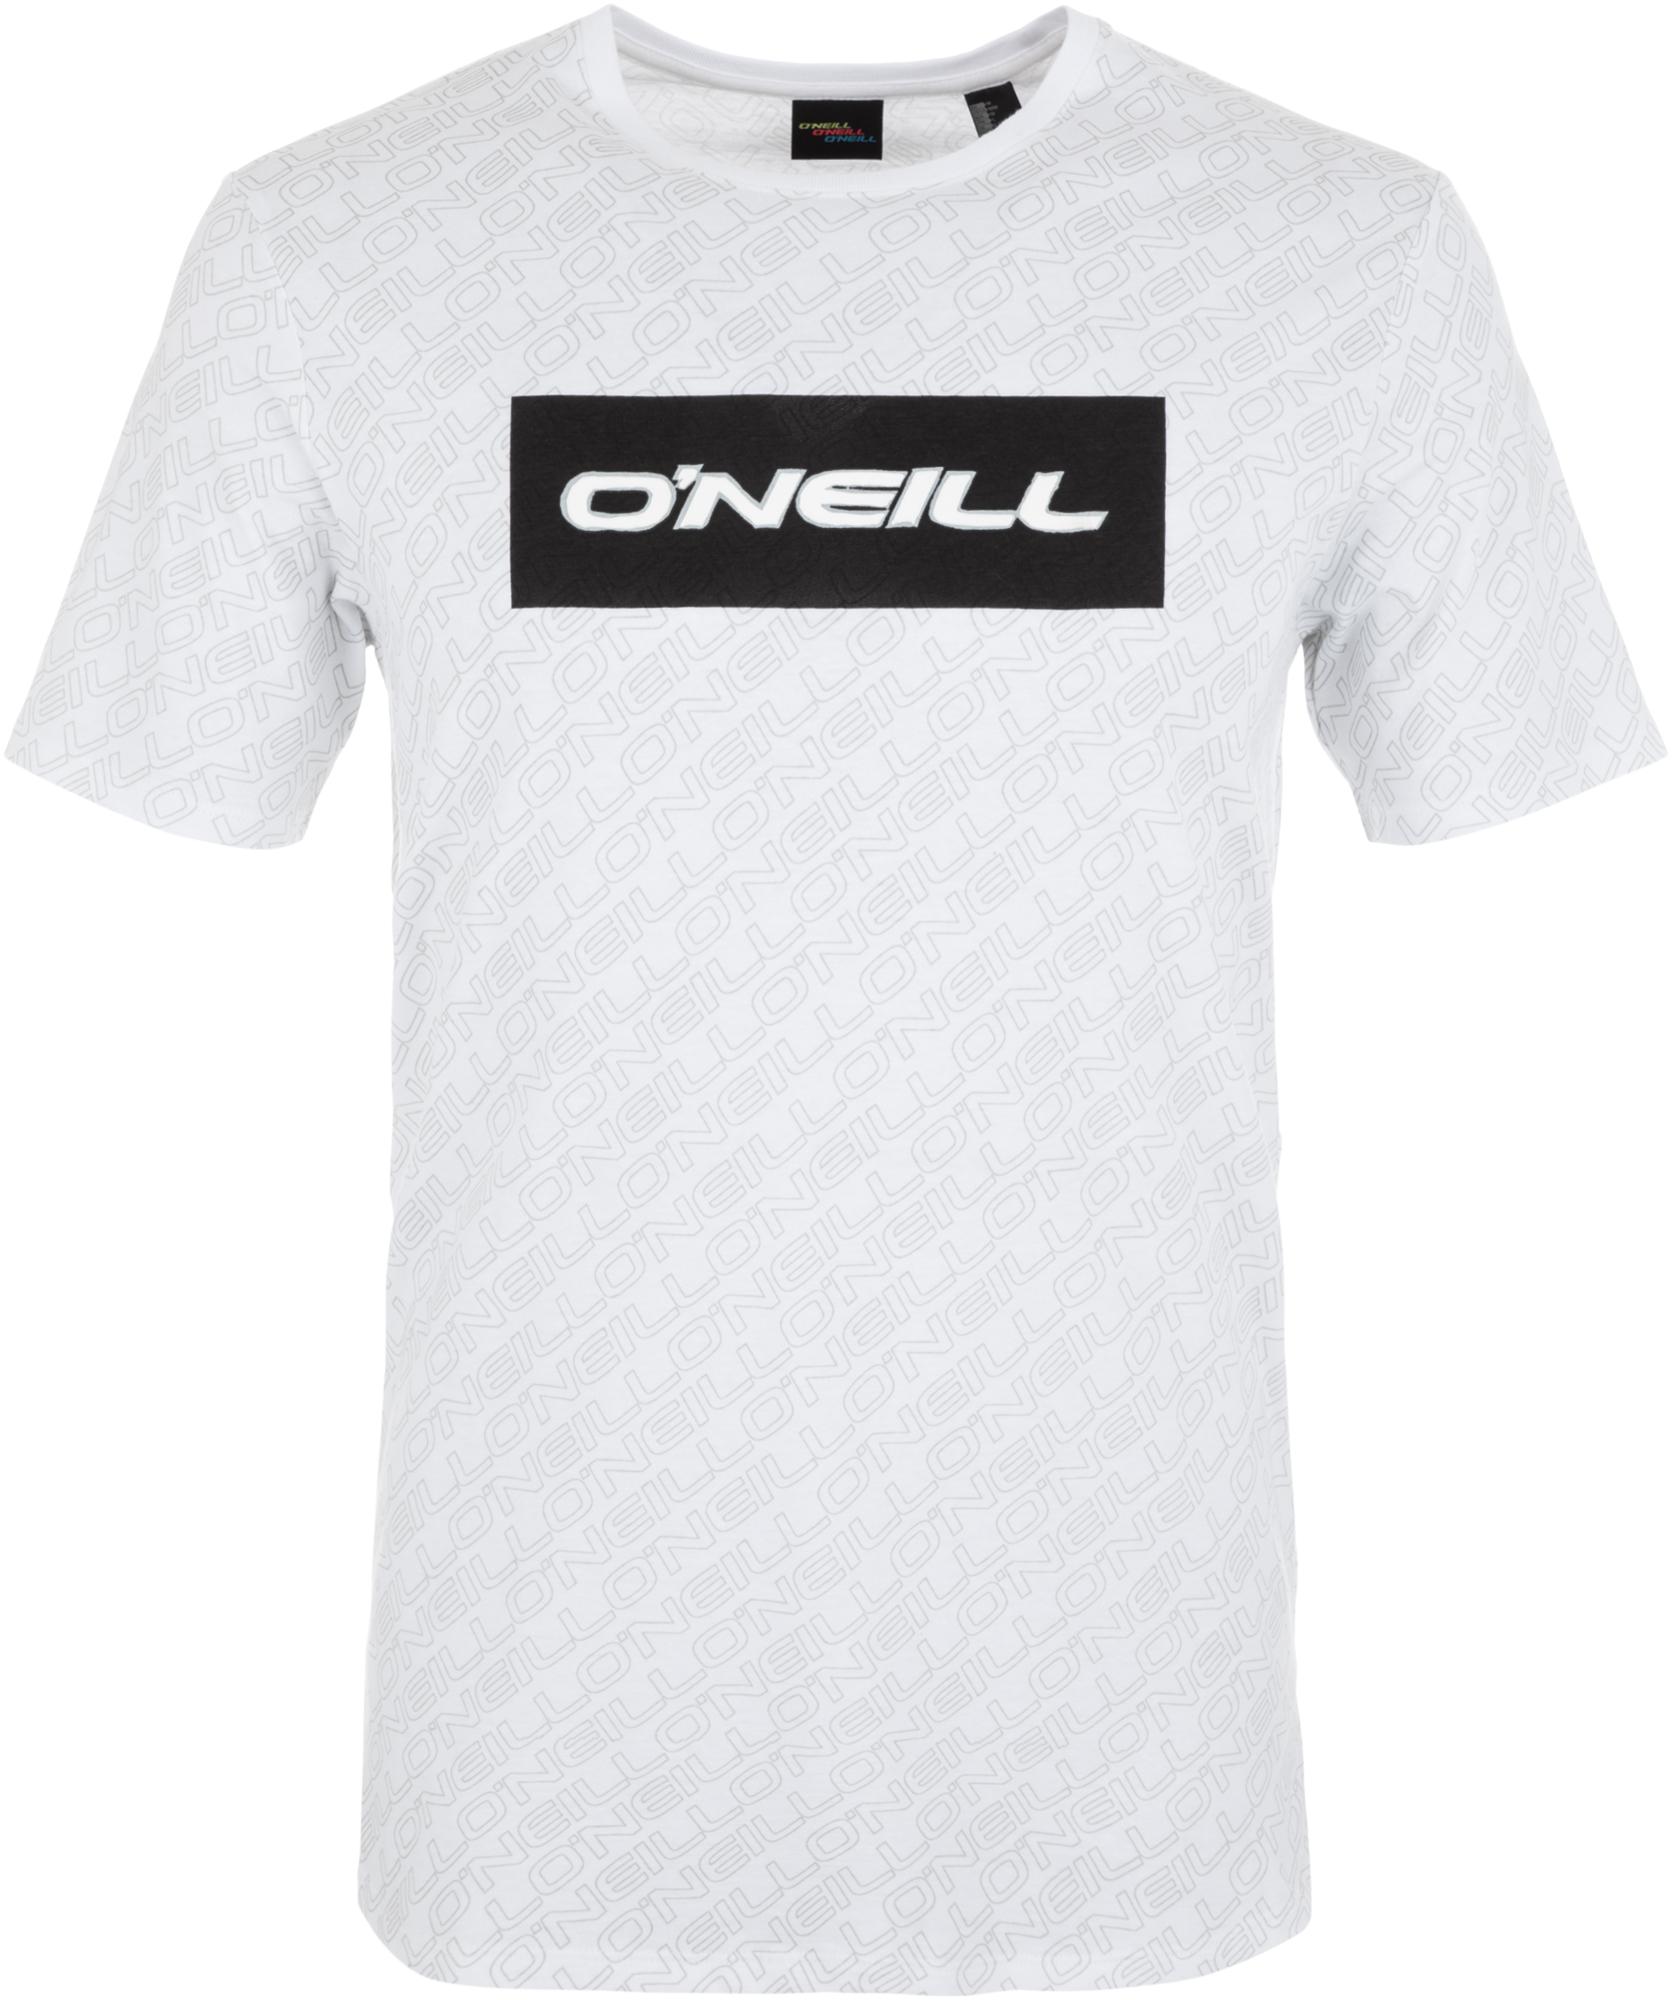 O'Neill Футболка мужская O'Neill Lm All Over Pring, размер 54-56